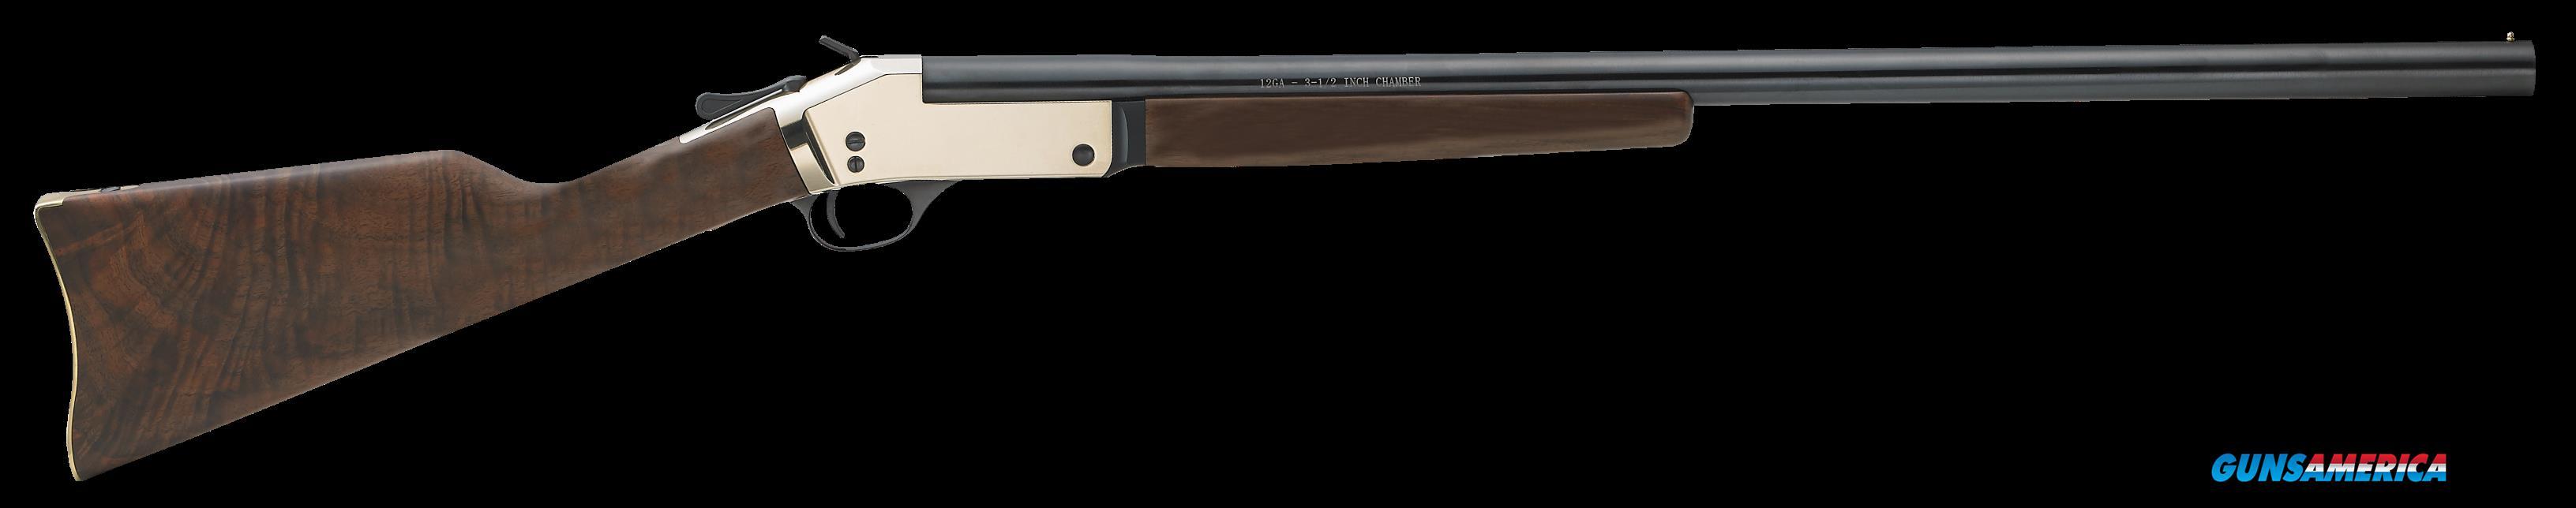 Henry Single Shot, Henry H015b12   Single Shot 12ga  Brass  Guns > Pistols > 1911 Pistol Copies (non-Colt)